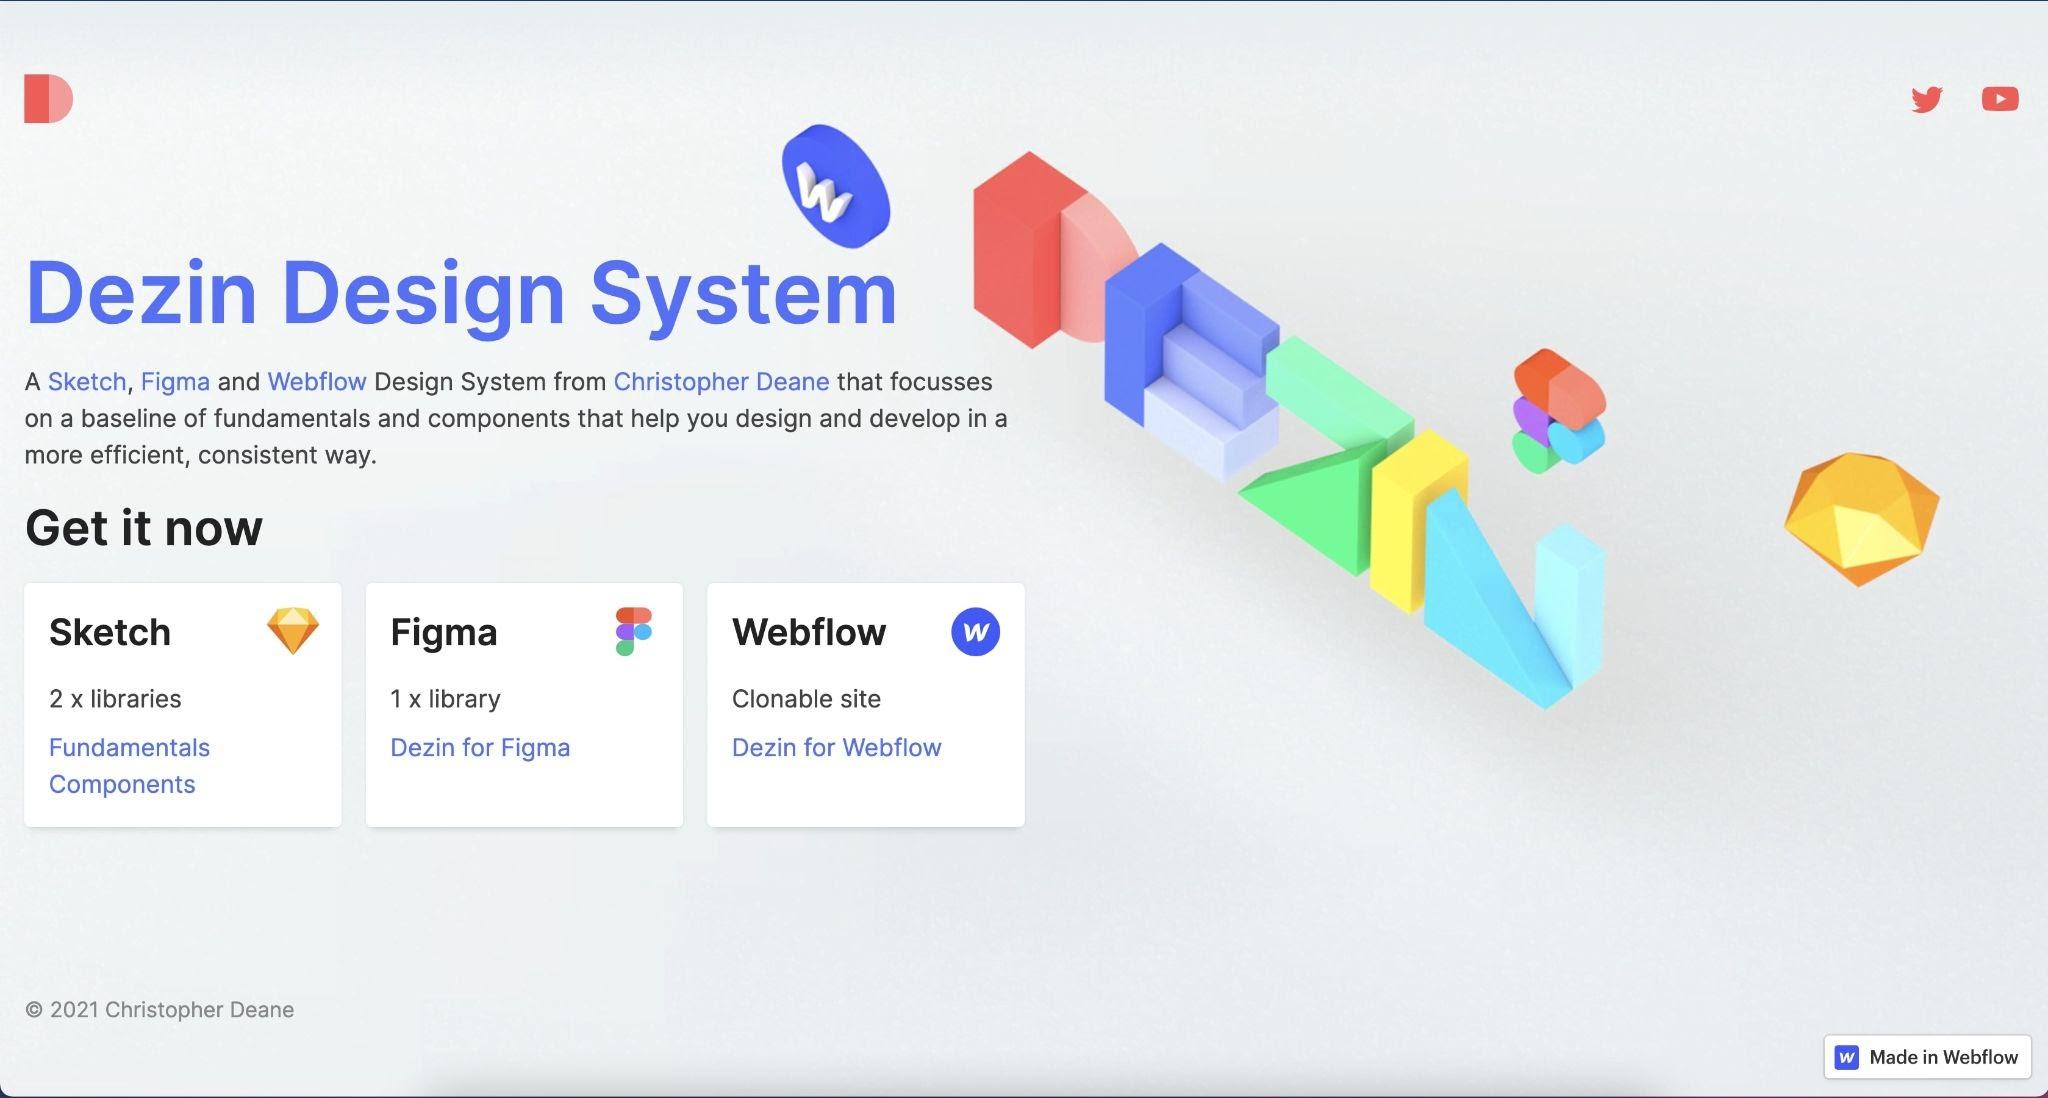 Screenshot of Dezin brand design system website.